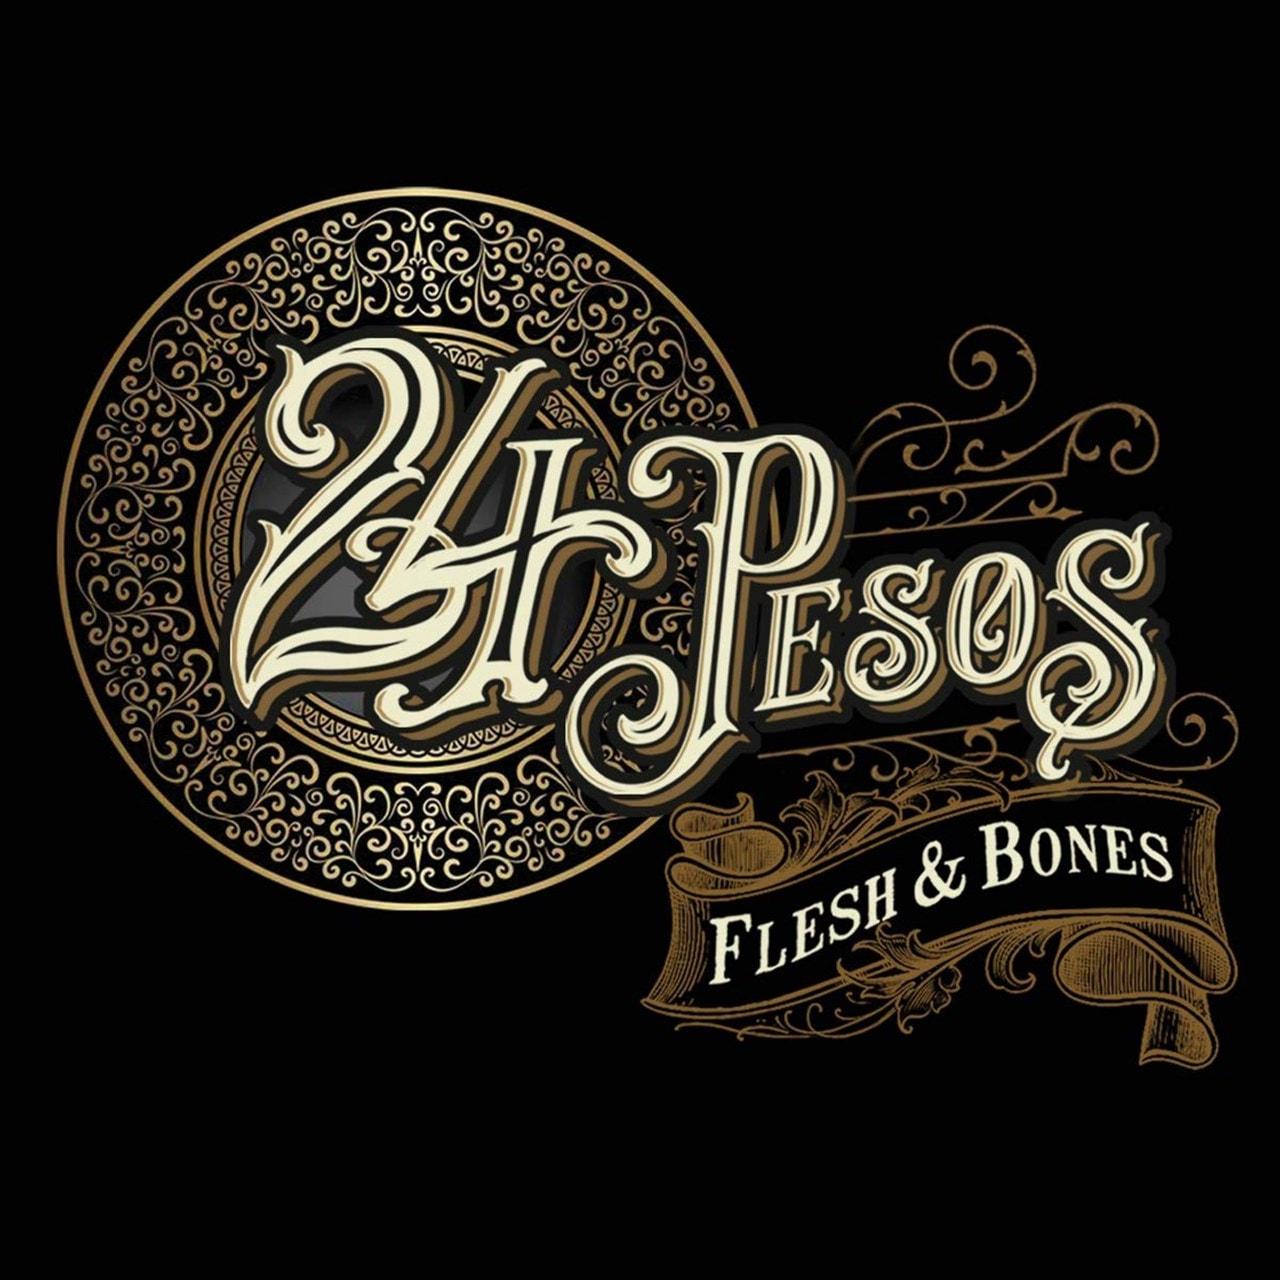 Flesh and Bones - 1